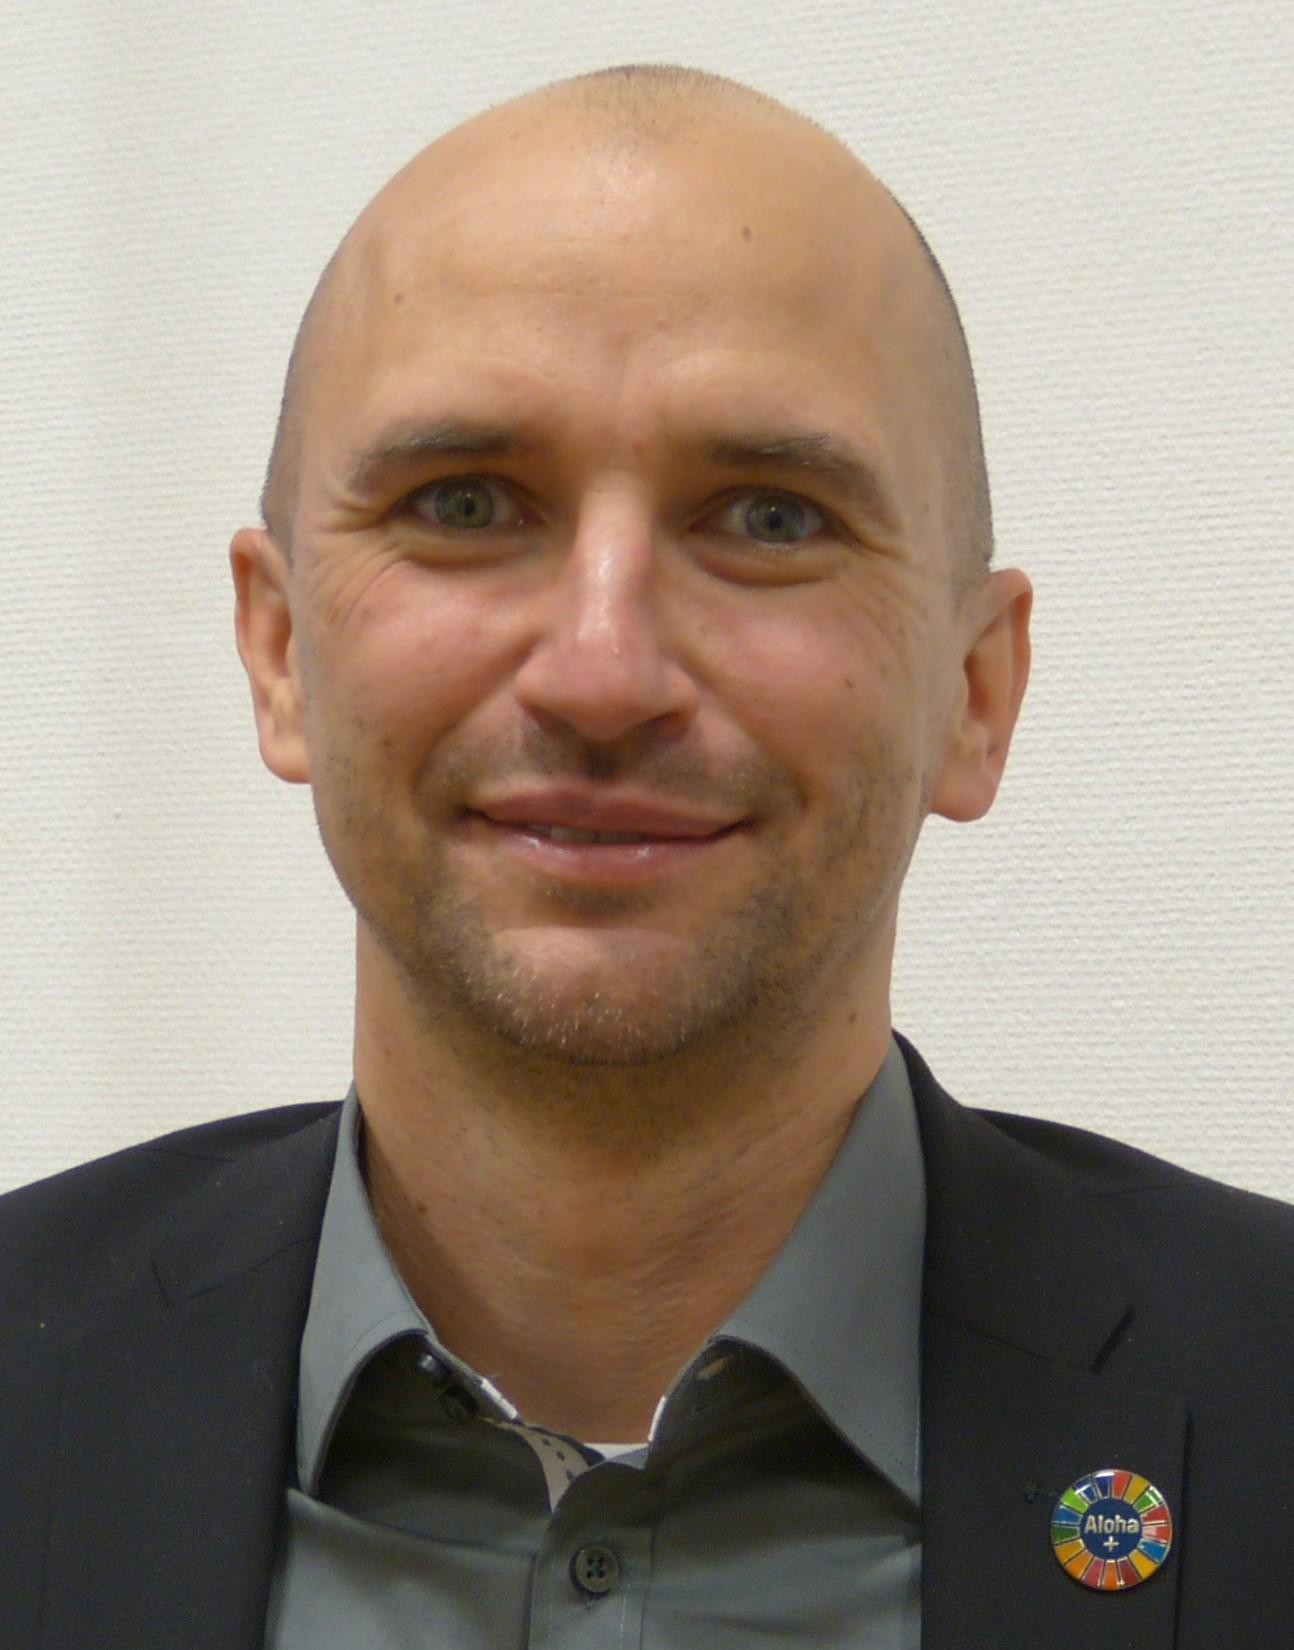 Prof. Dr. Matthias Barth